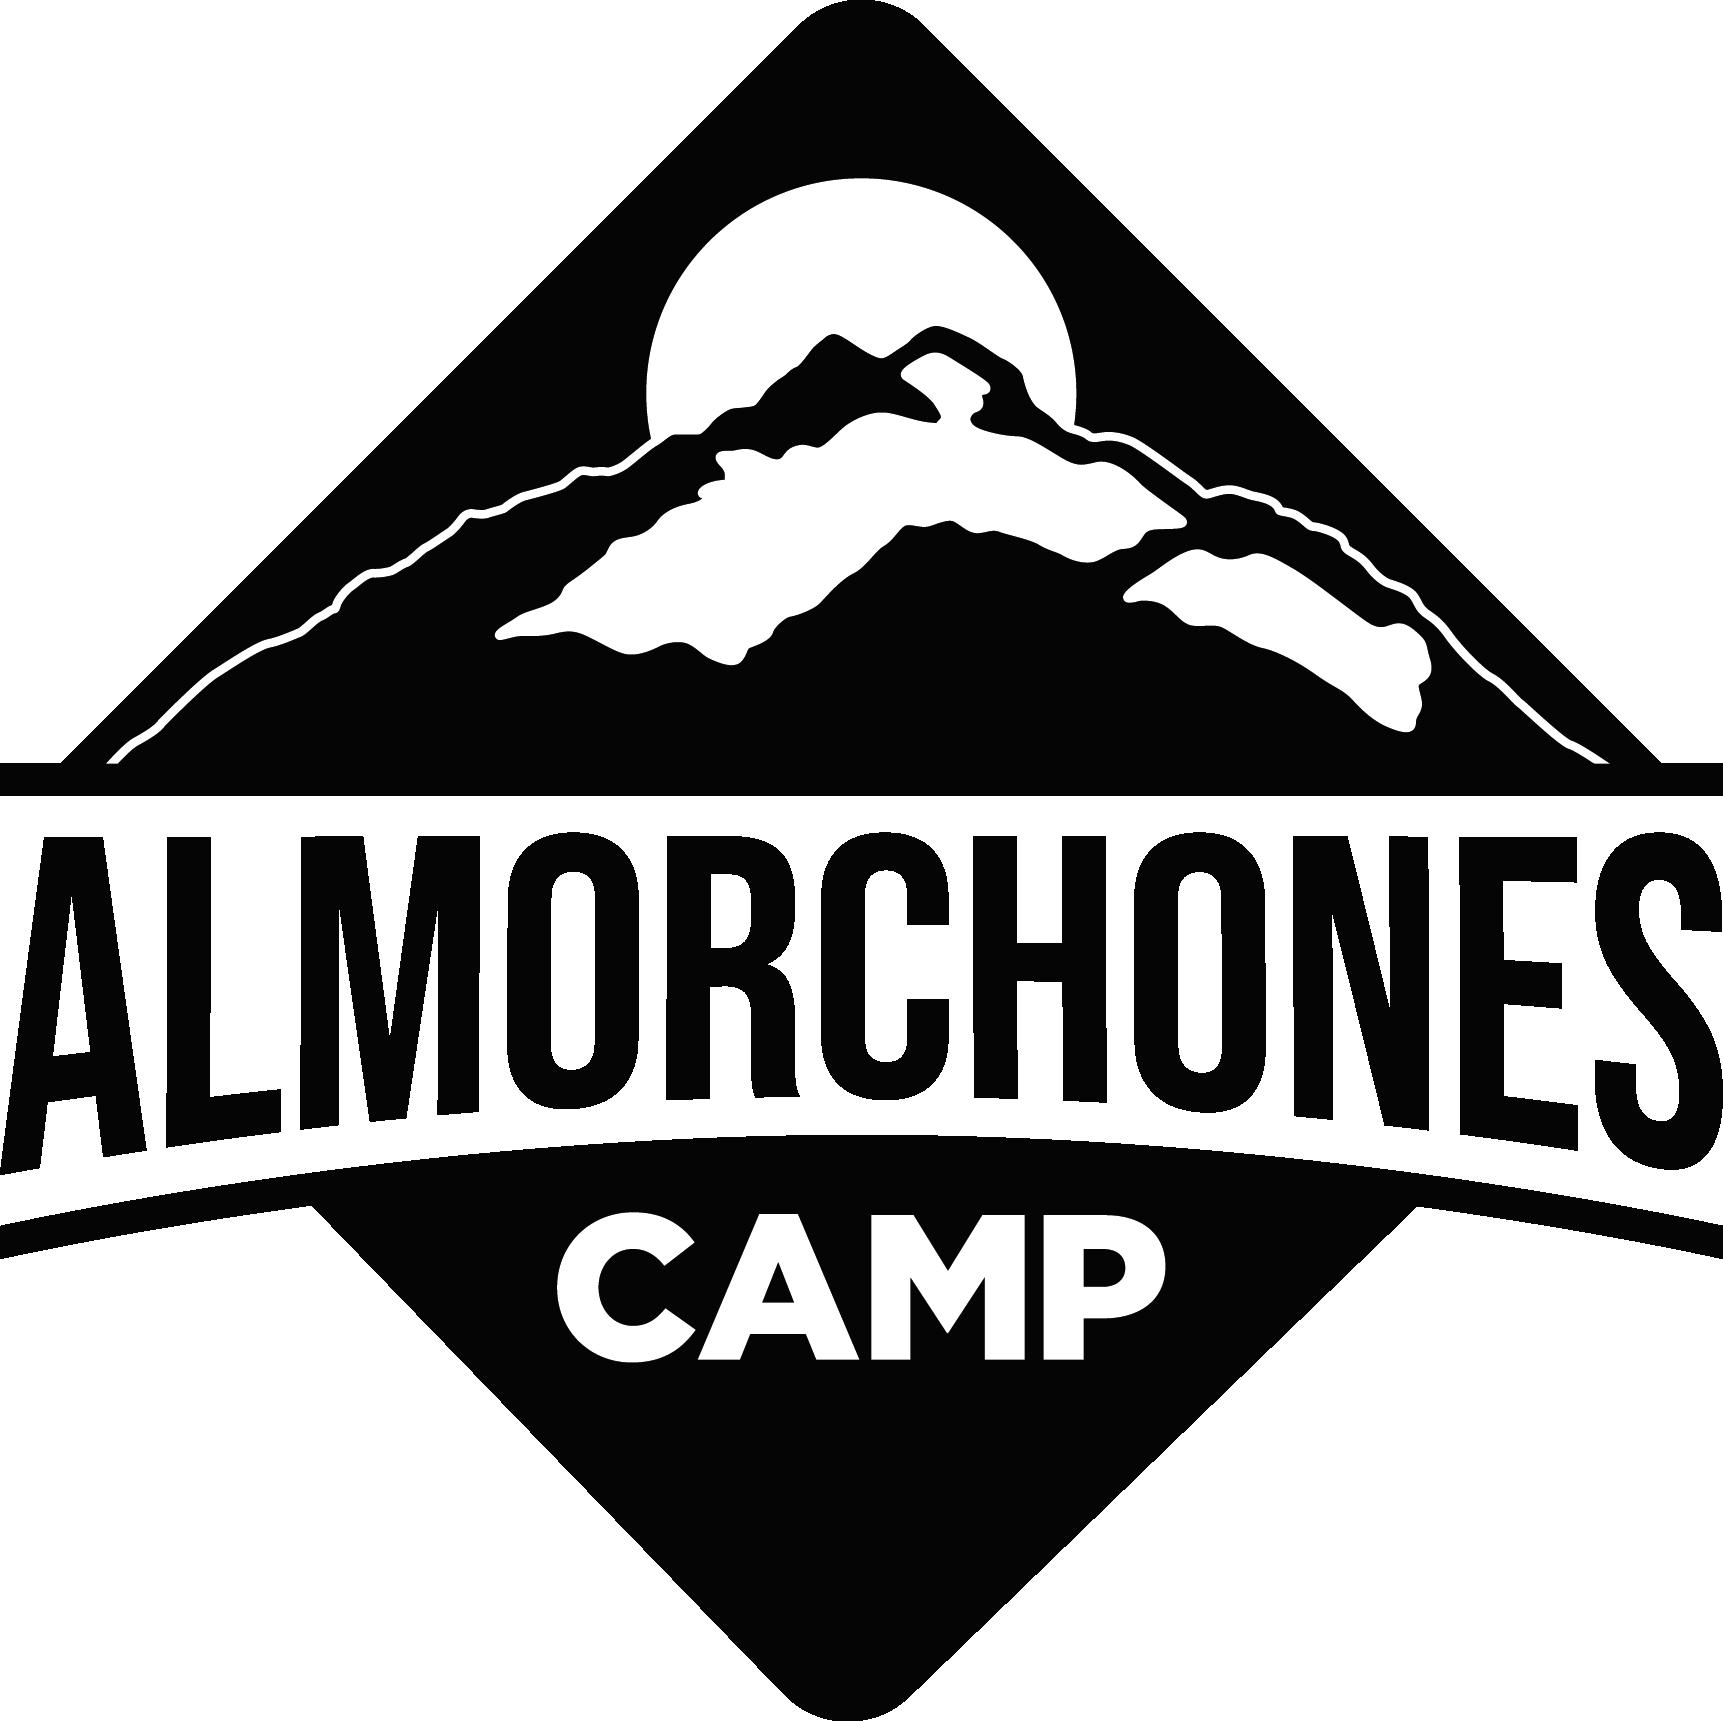 Almorchones Camp